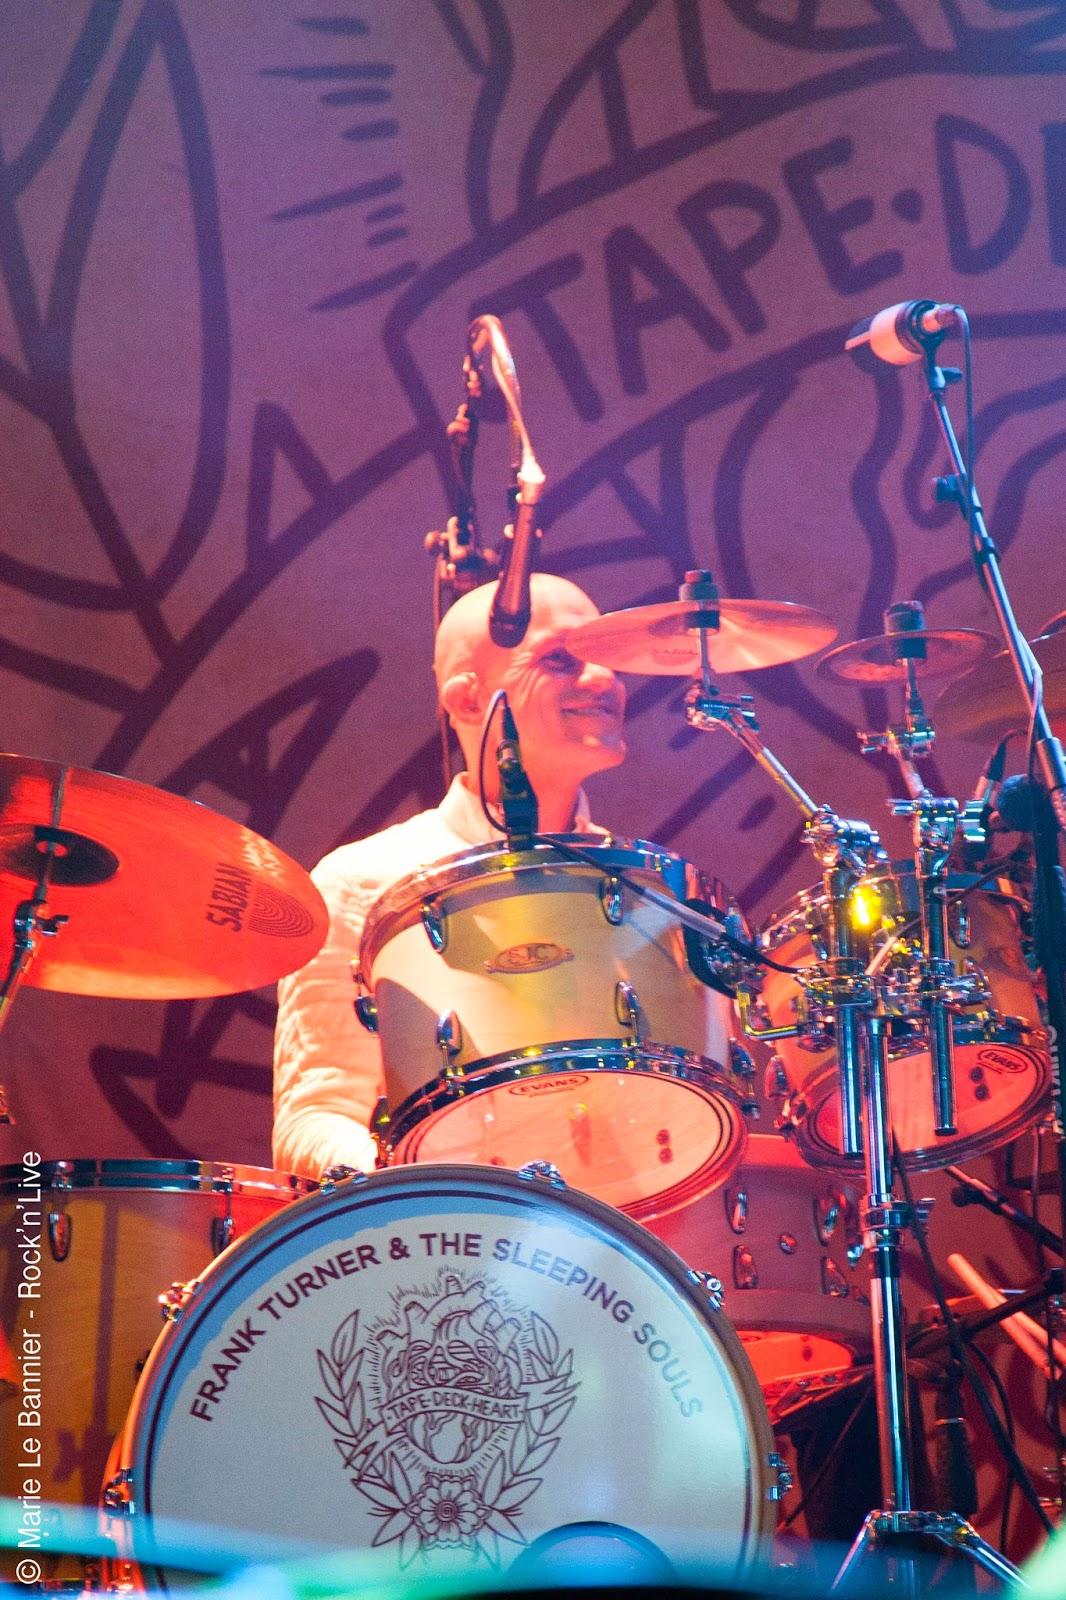 Frank Turner The Sleeping Souls Recovery Rock'n'Live 2014 Rock Marie Le Bannier Fête de la Musique Dudelange Tape Deck Heart Concert Live Festival